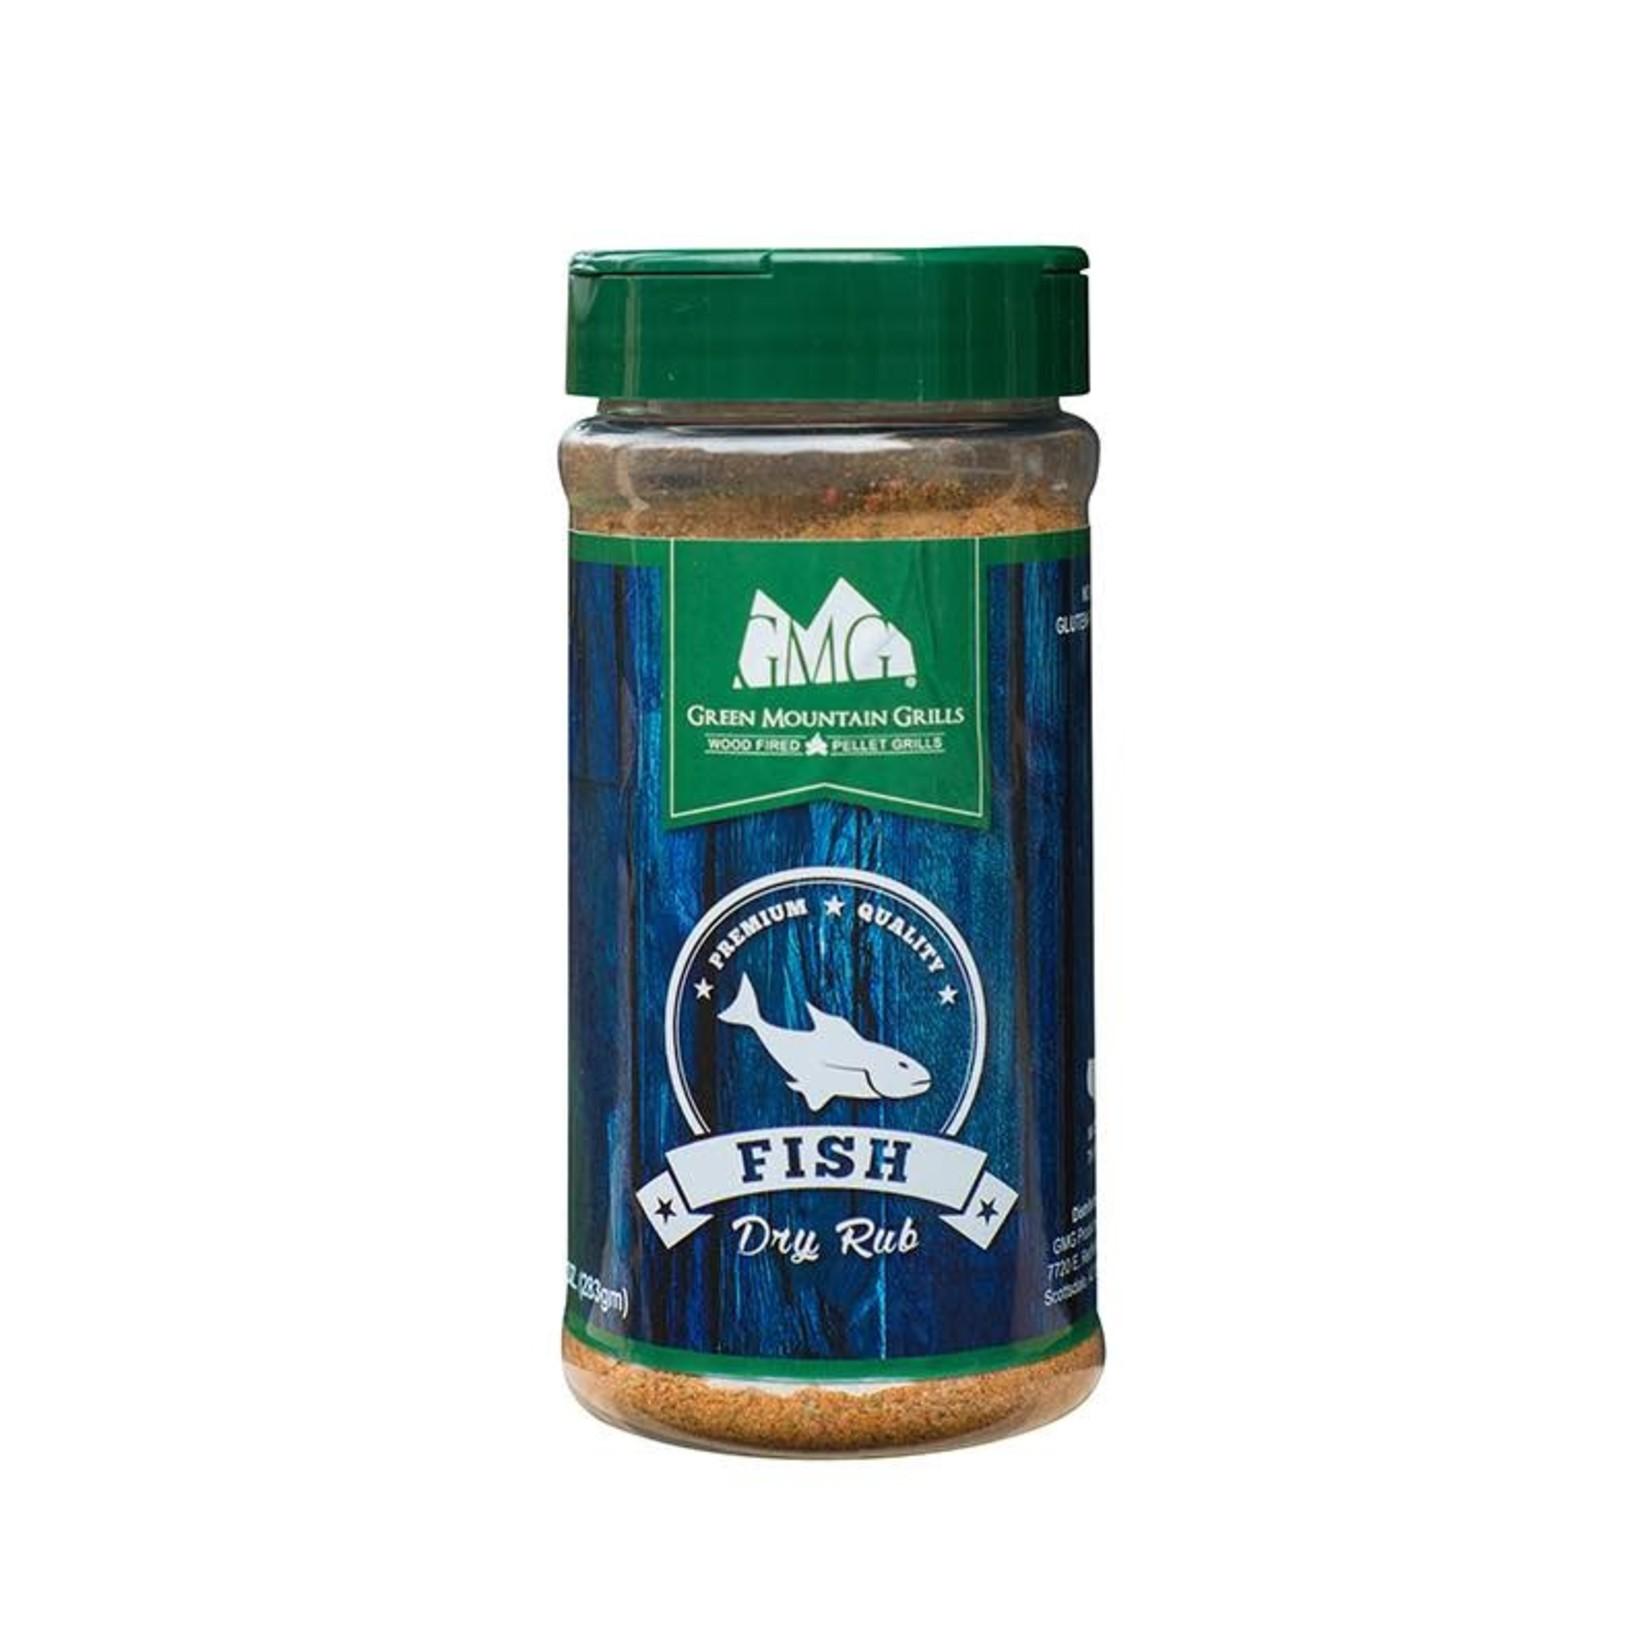 Green Mountain Grill GMG Fish rub